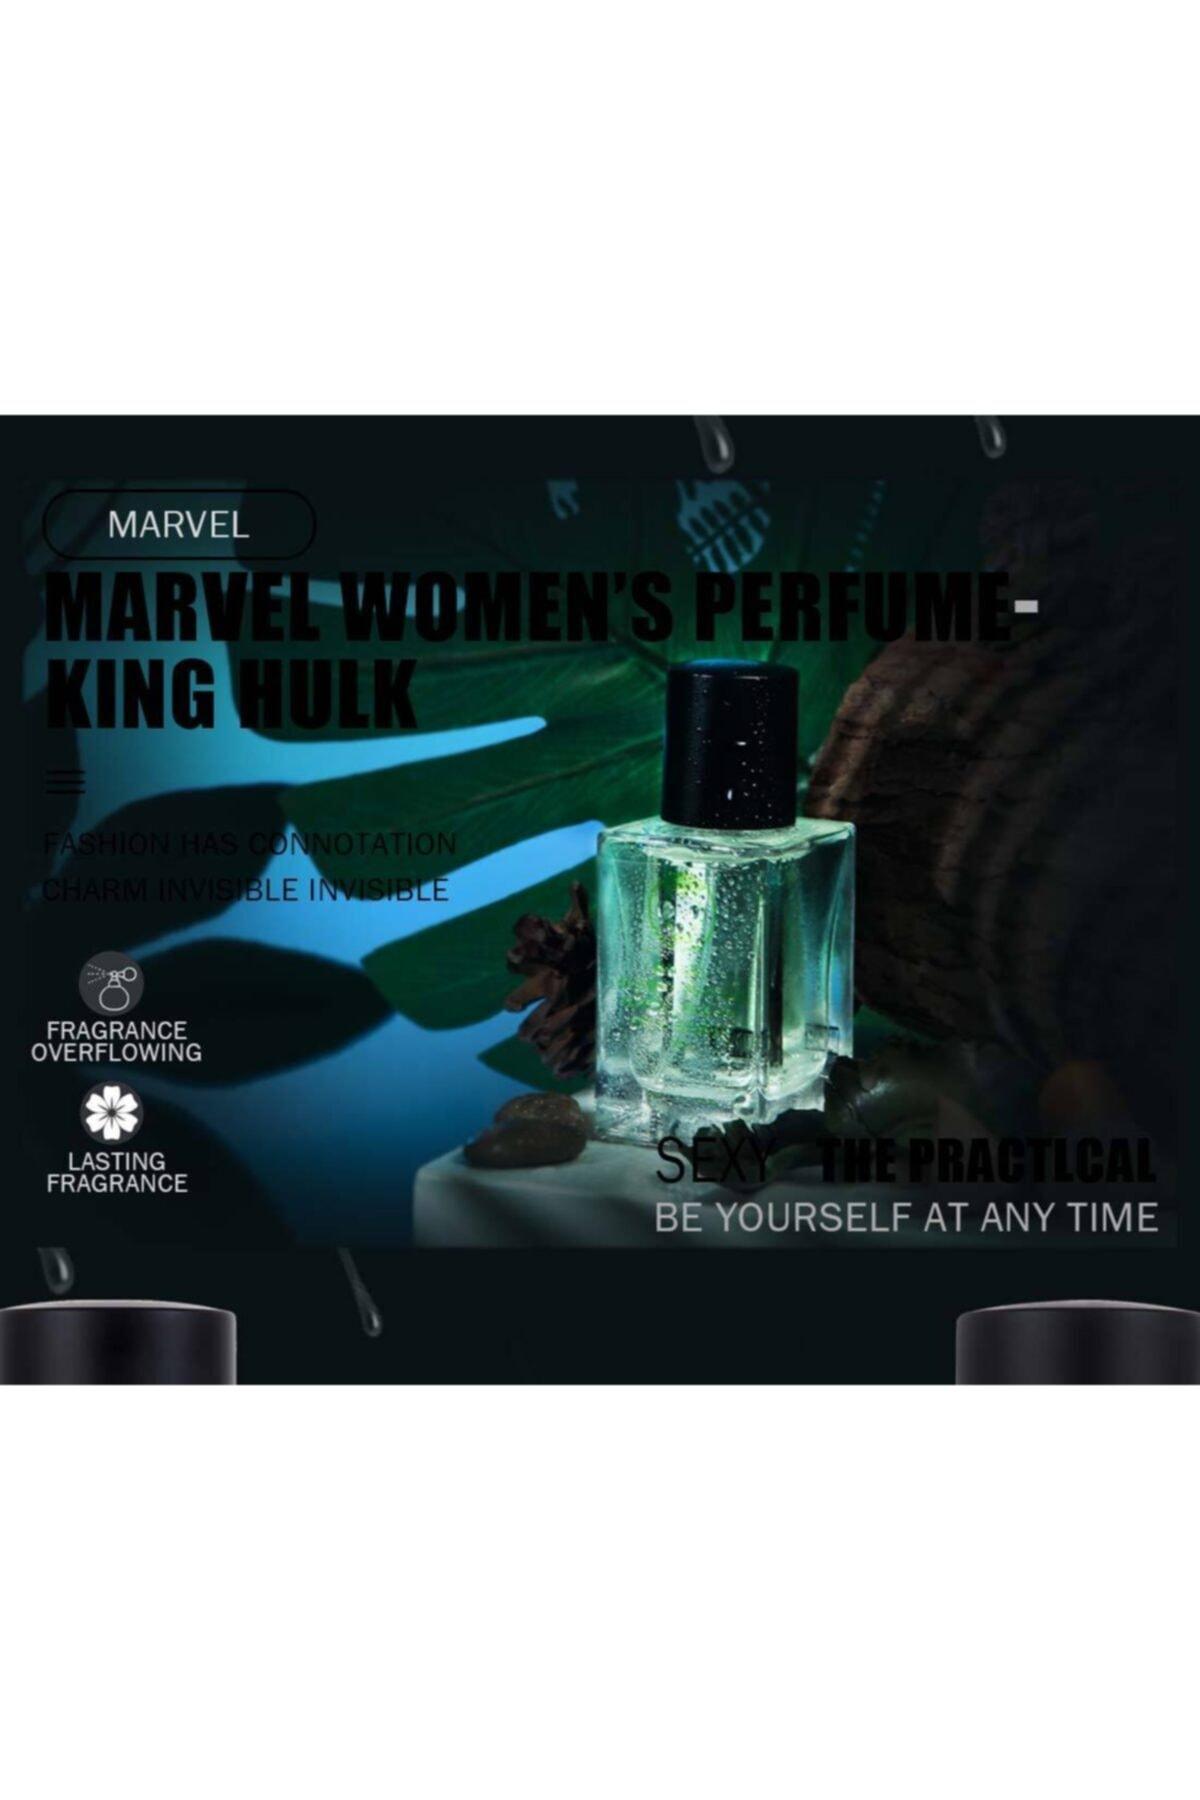 Miniso Marvel Kadın Parfüm, Hulk 30 ml 6922655766275 2